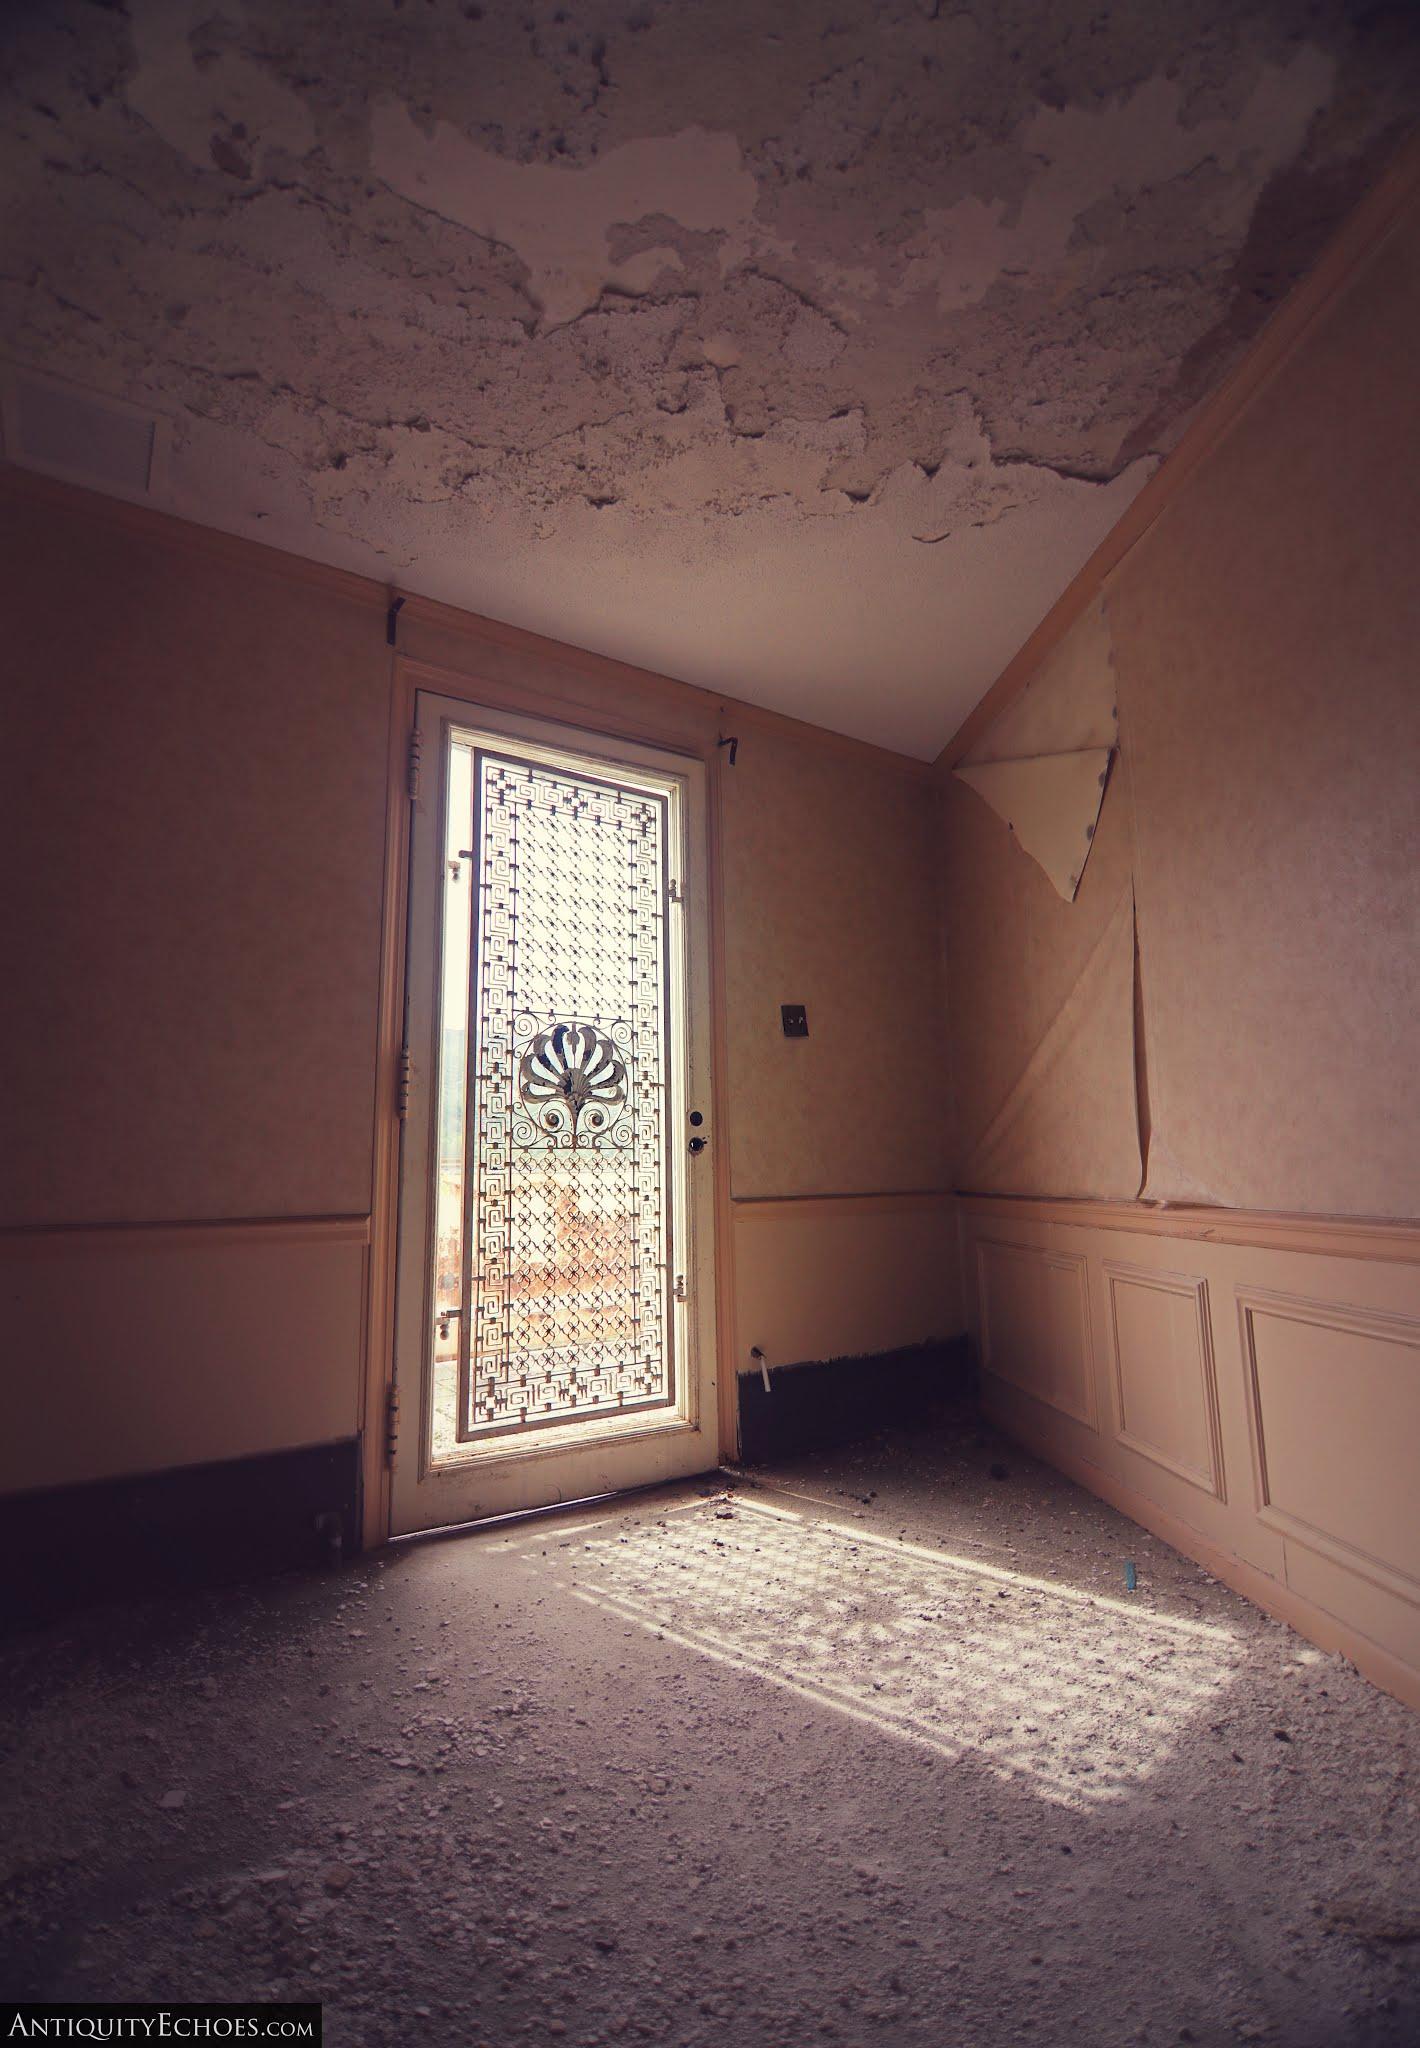 Nevele Grande - Ornate Balcony Door